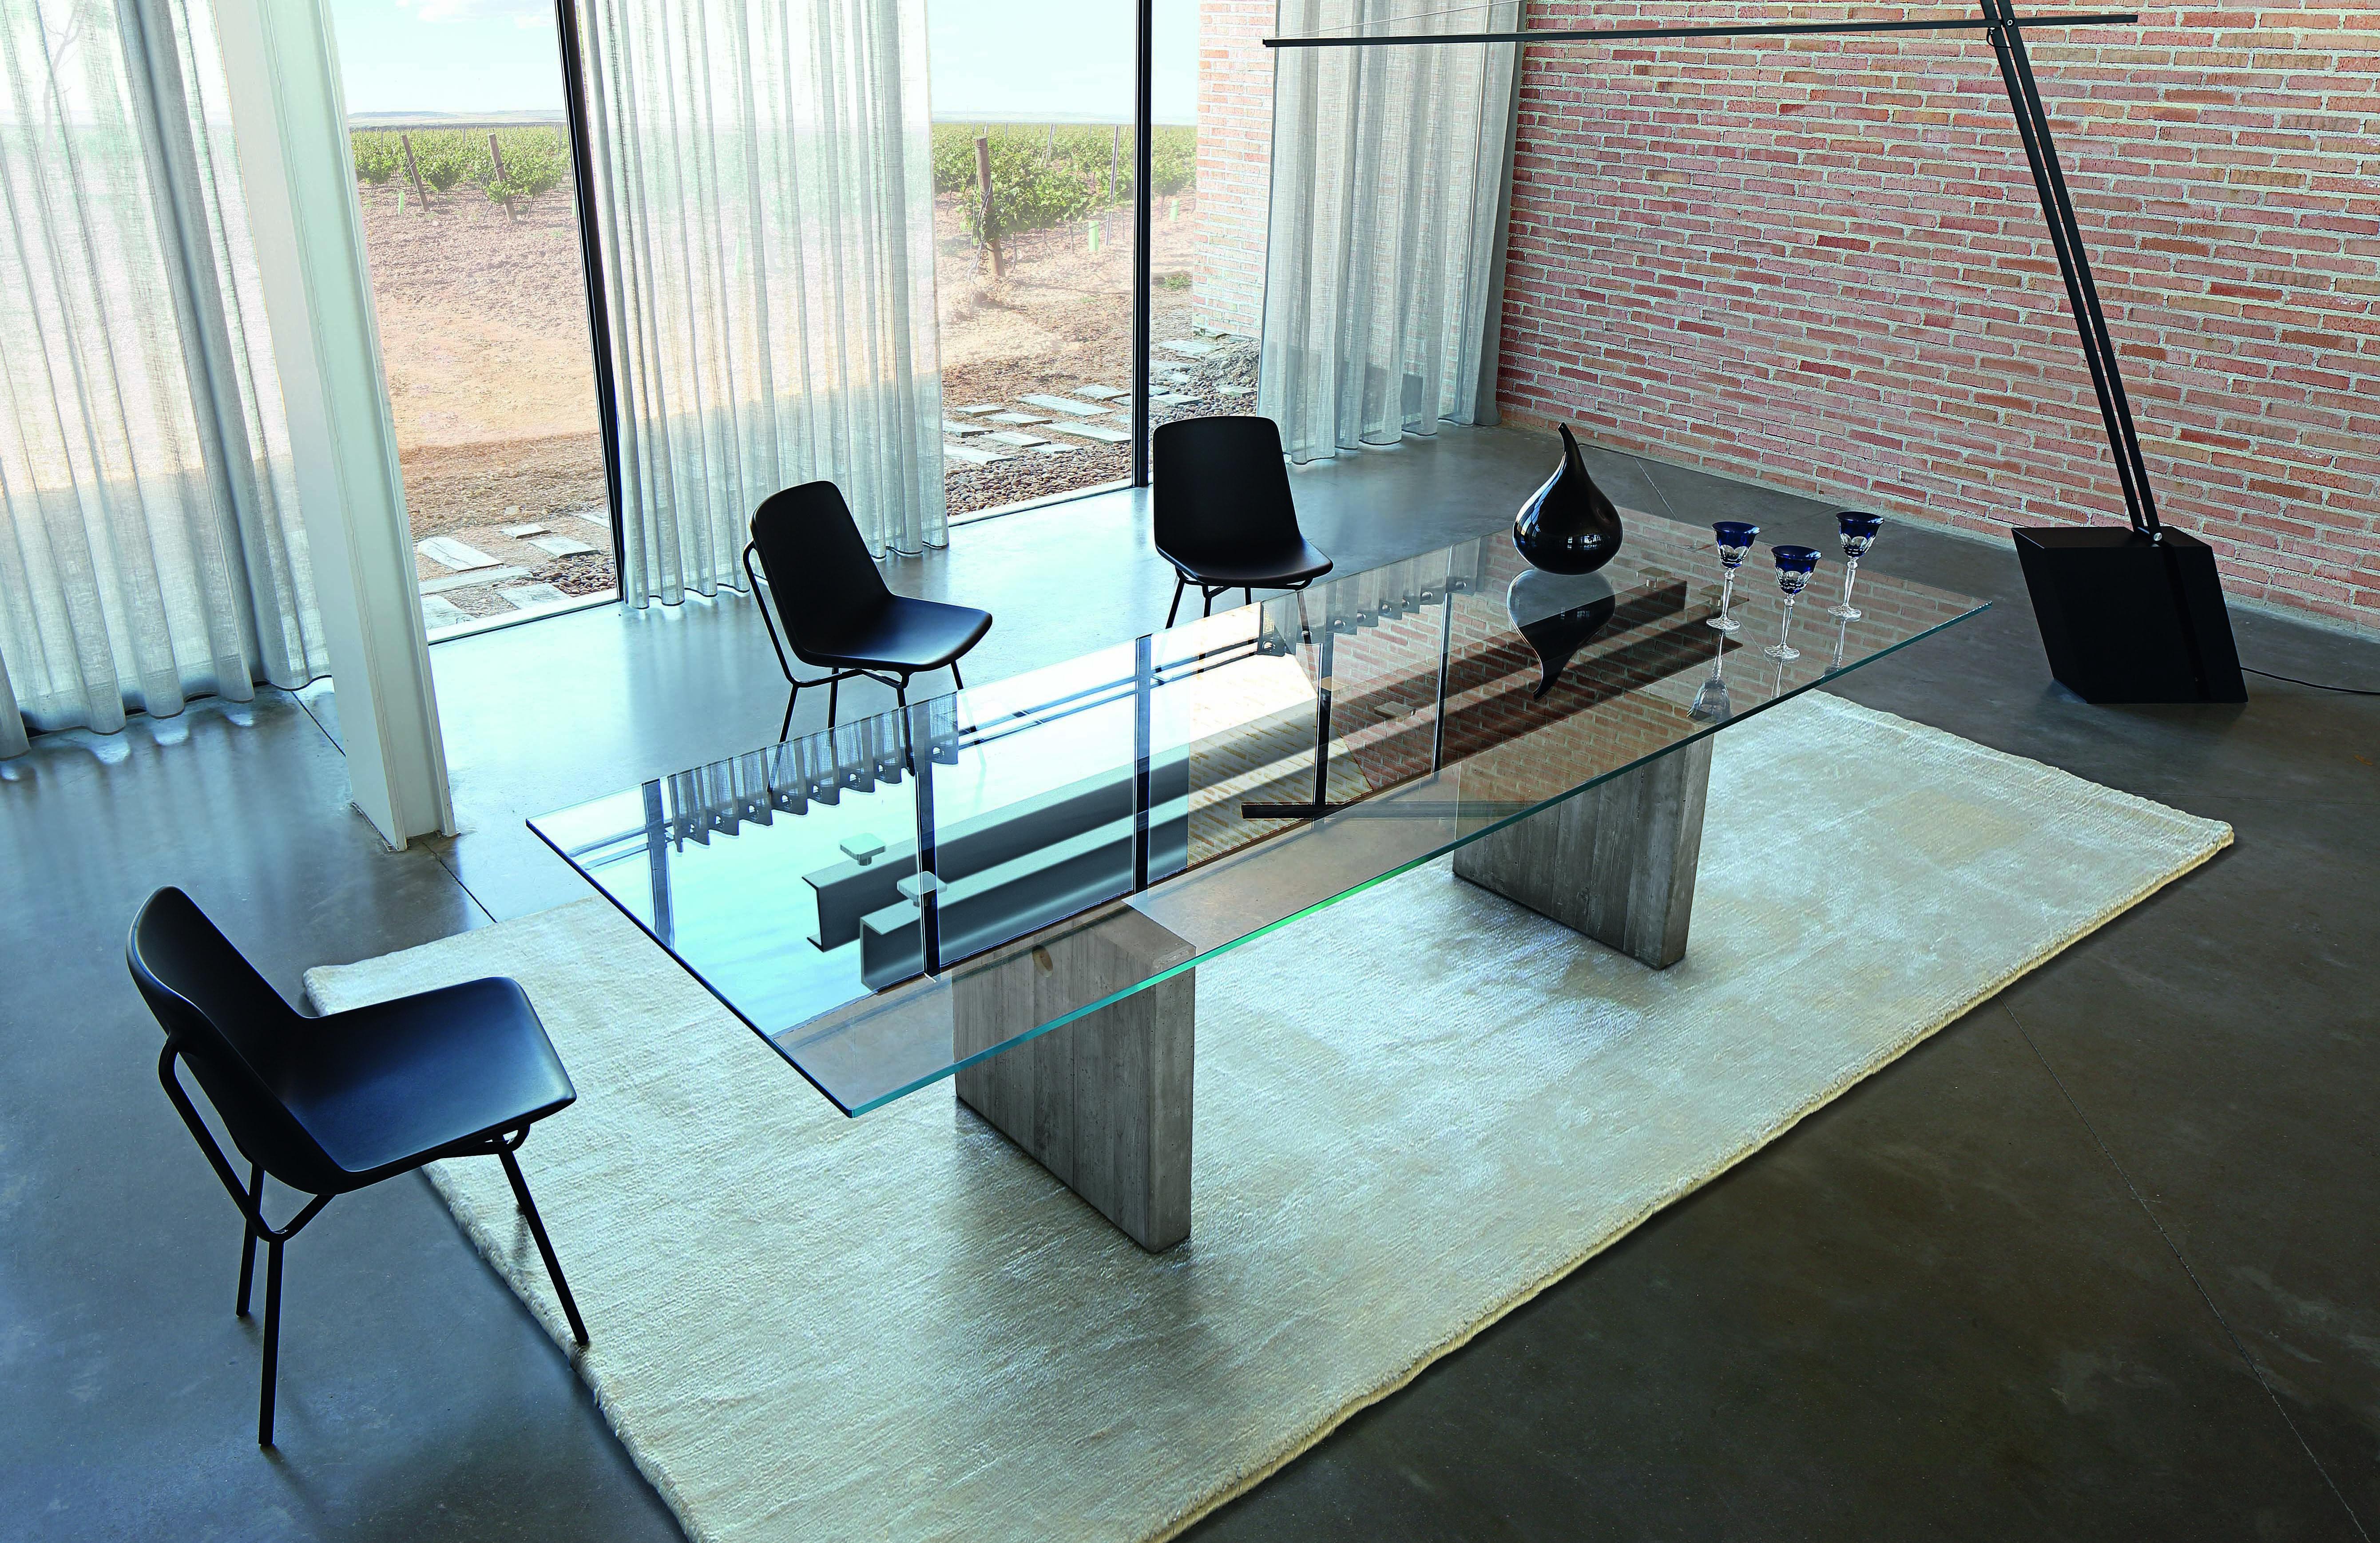 Roche Bobois - LESS IS MORE dining table - Studio Roche Bobois ...